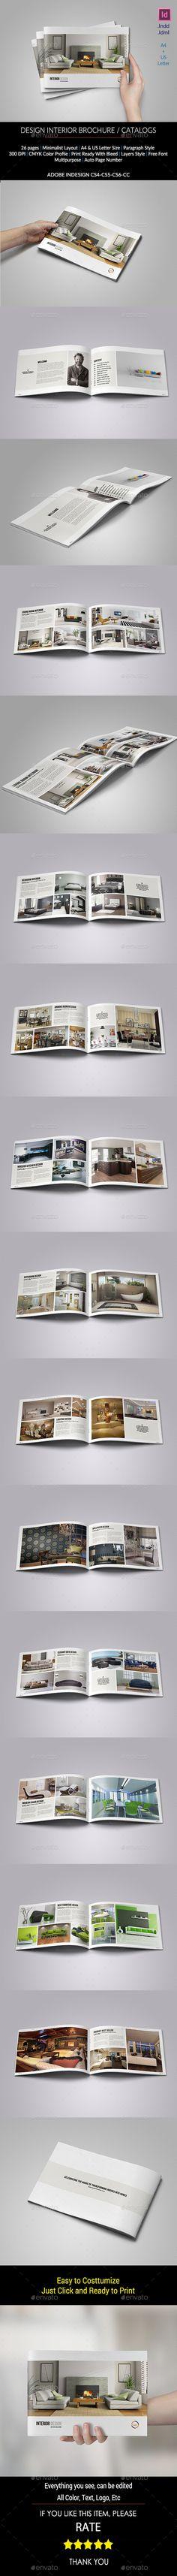 Interior Brochure / Catalogs / Portfolio Design Template #brochure Download: http://graphicriver.net/item/interior-brochure-catalogs-portfolio/11375181?ref=ksioks